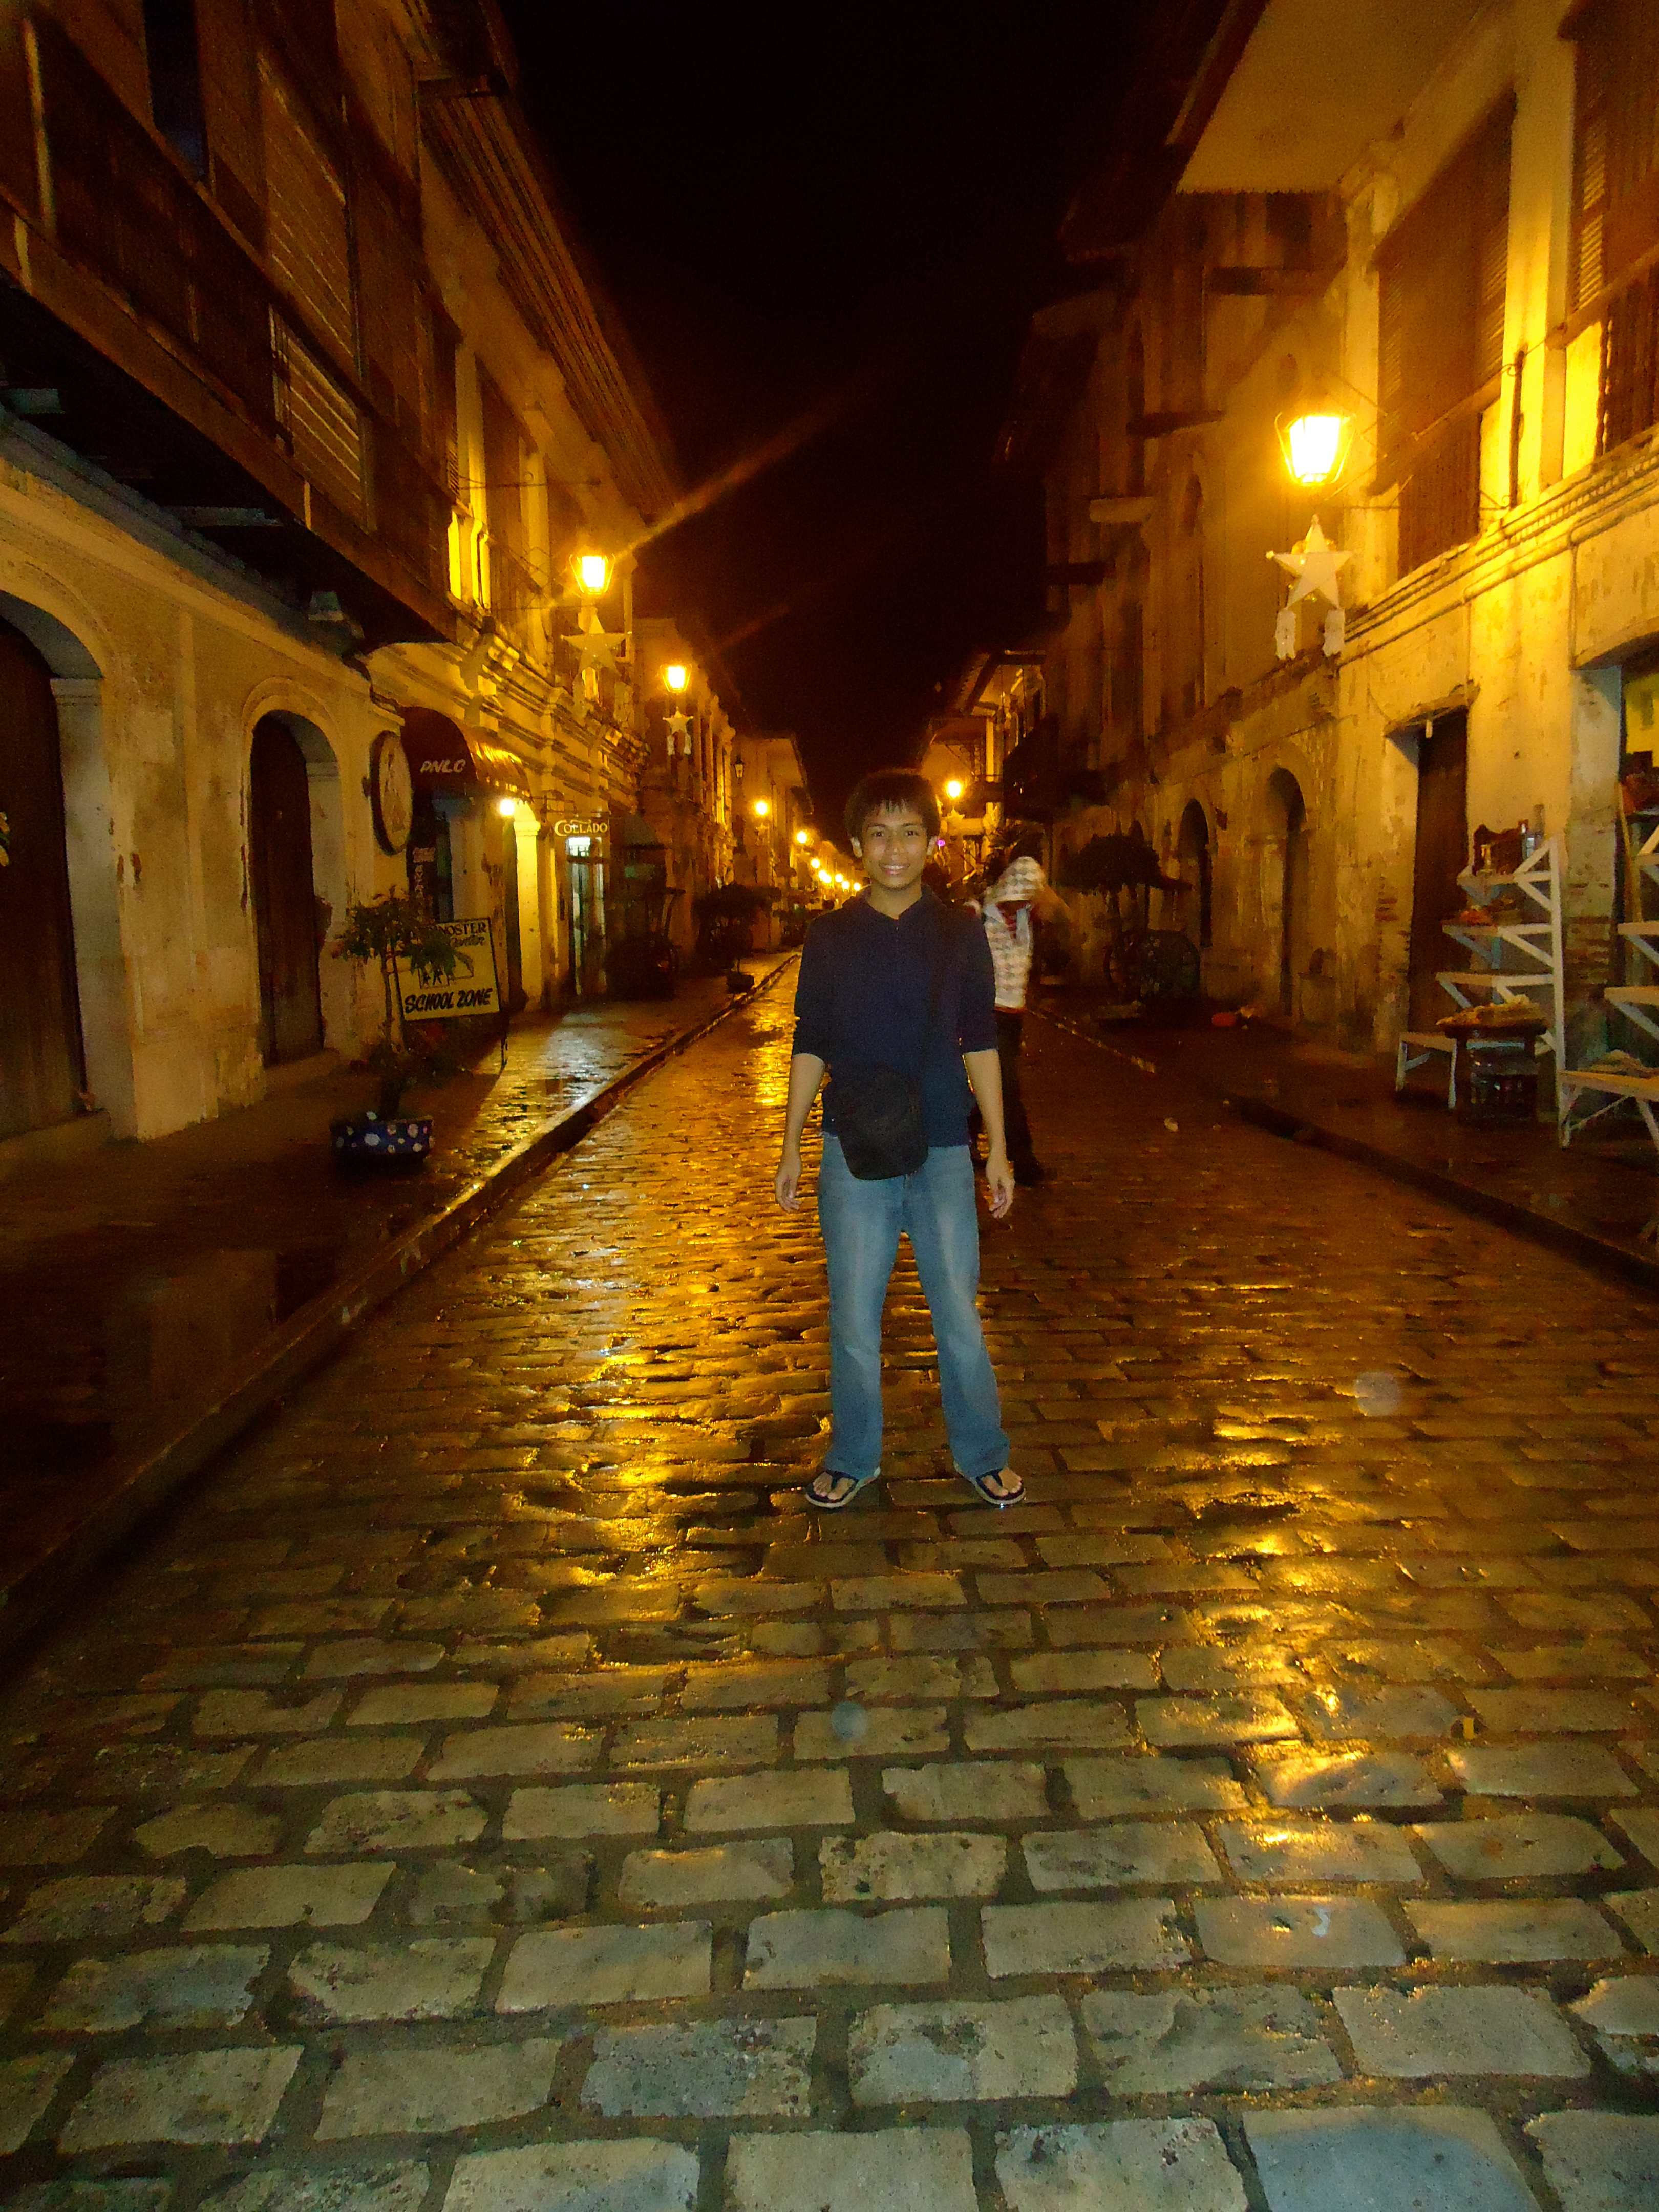 Town of Vigan Historic Town of Vigan - Philippines carlos ortiz